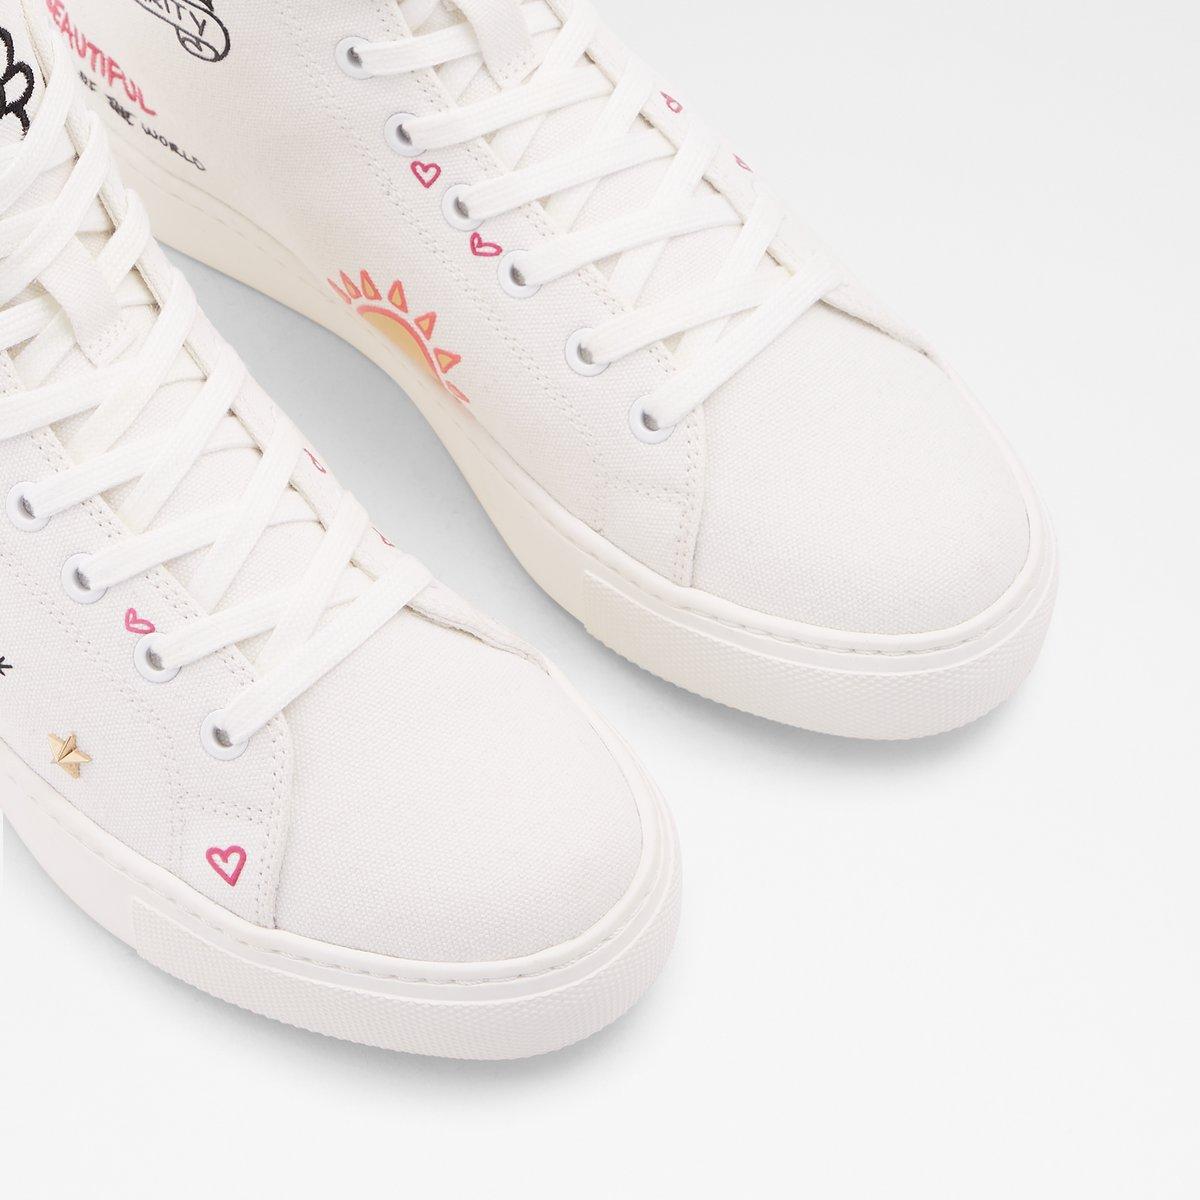 Love1972 White Women's Sneakers | ALDO US